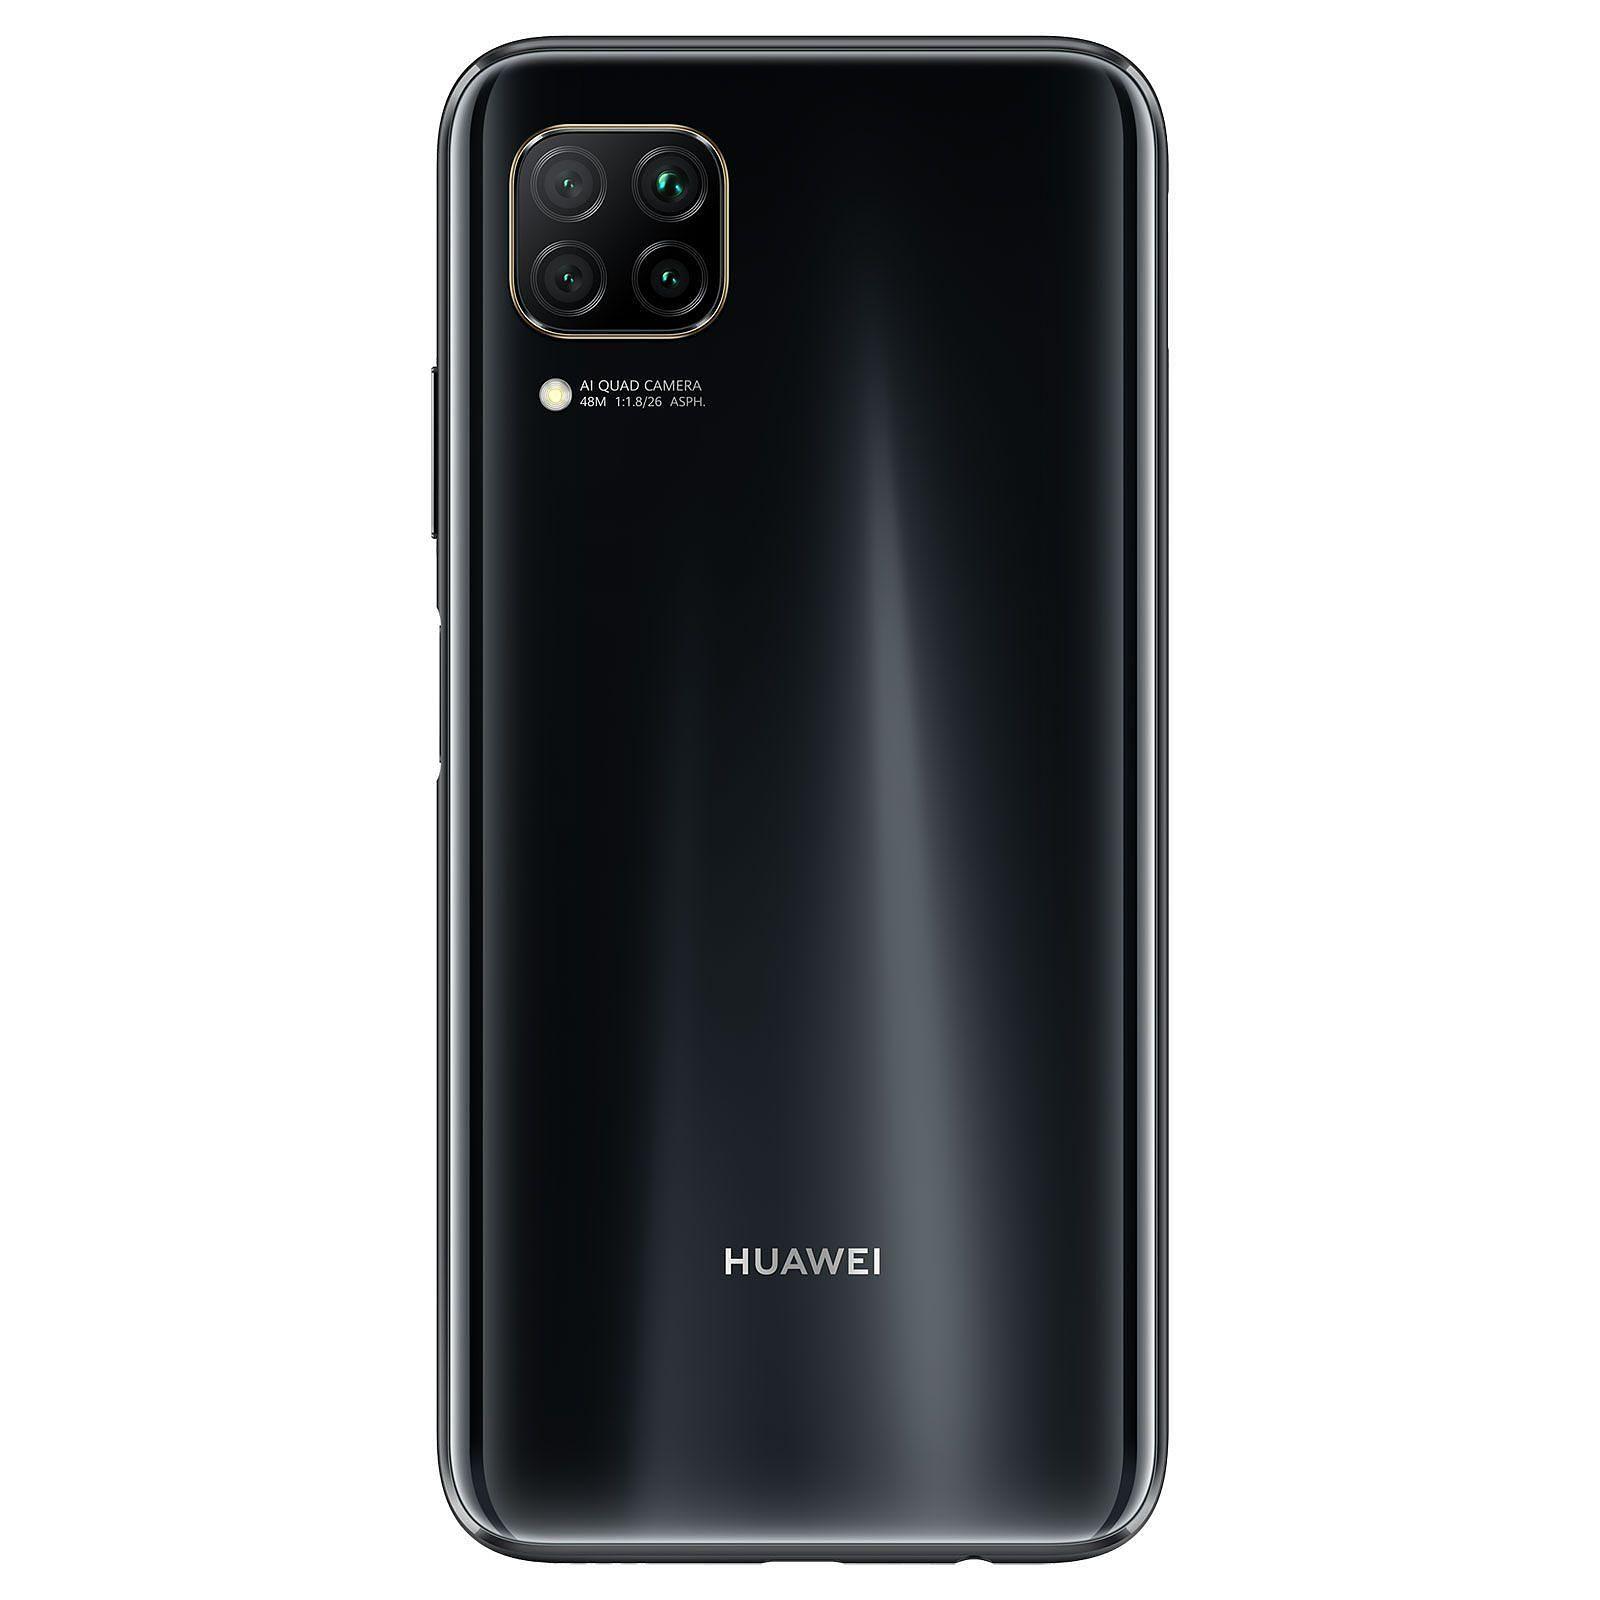 HUAWEI P40 lite 6/128 GB 861324046192029 - 4